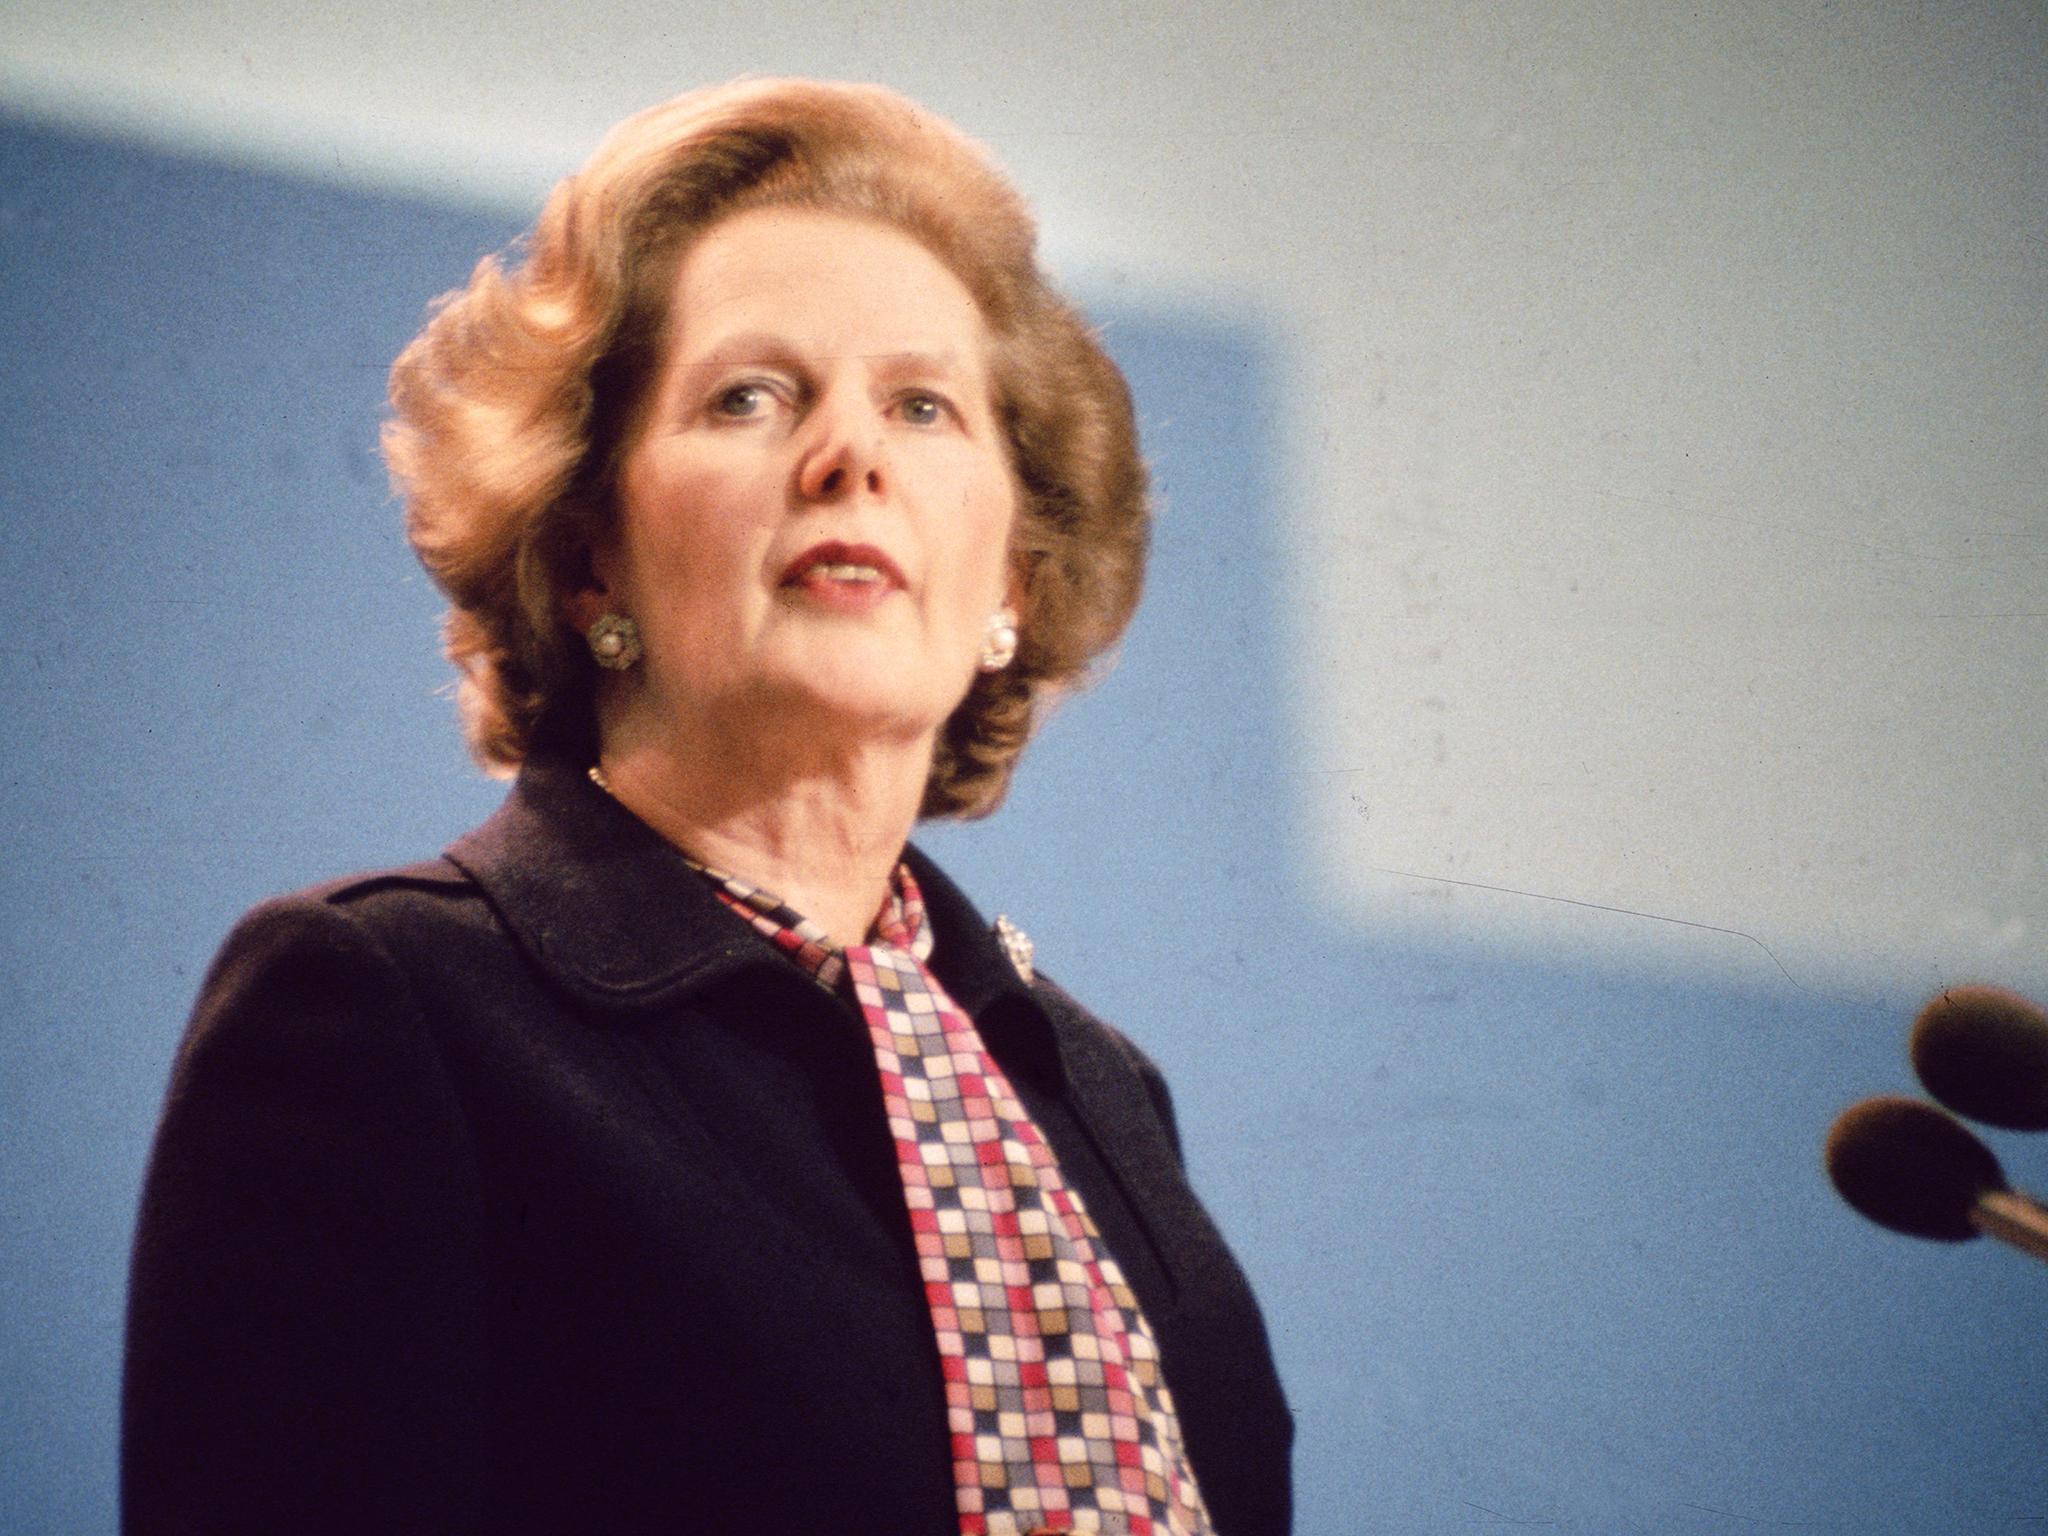 On failed assassination attempt on Prime Minister Margaret Thatcher: